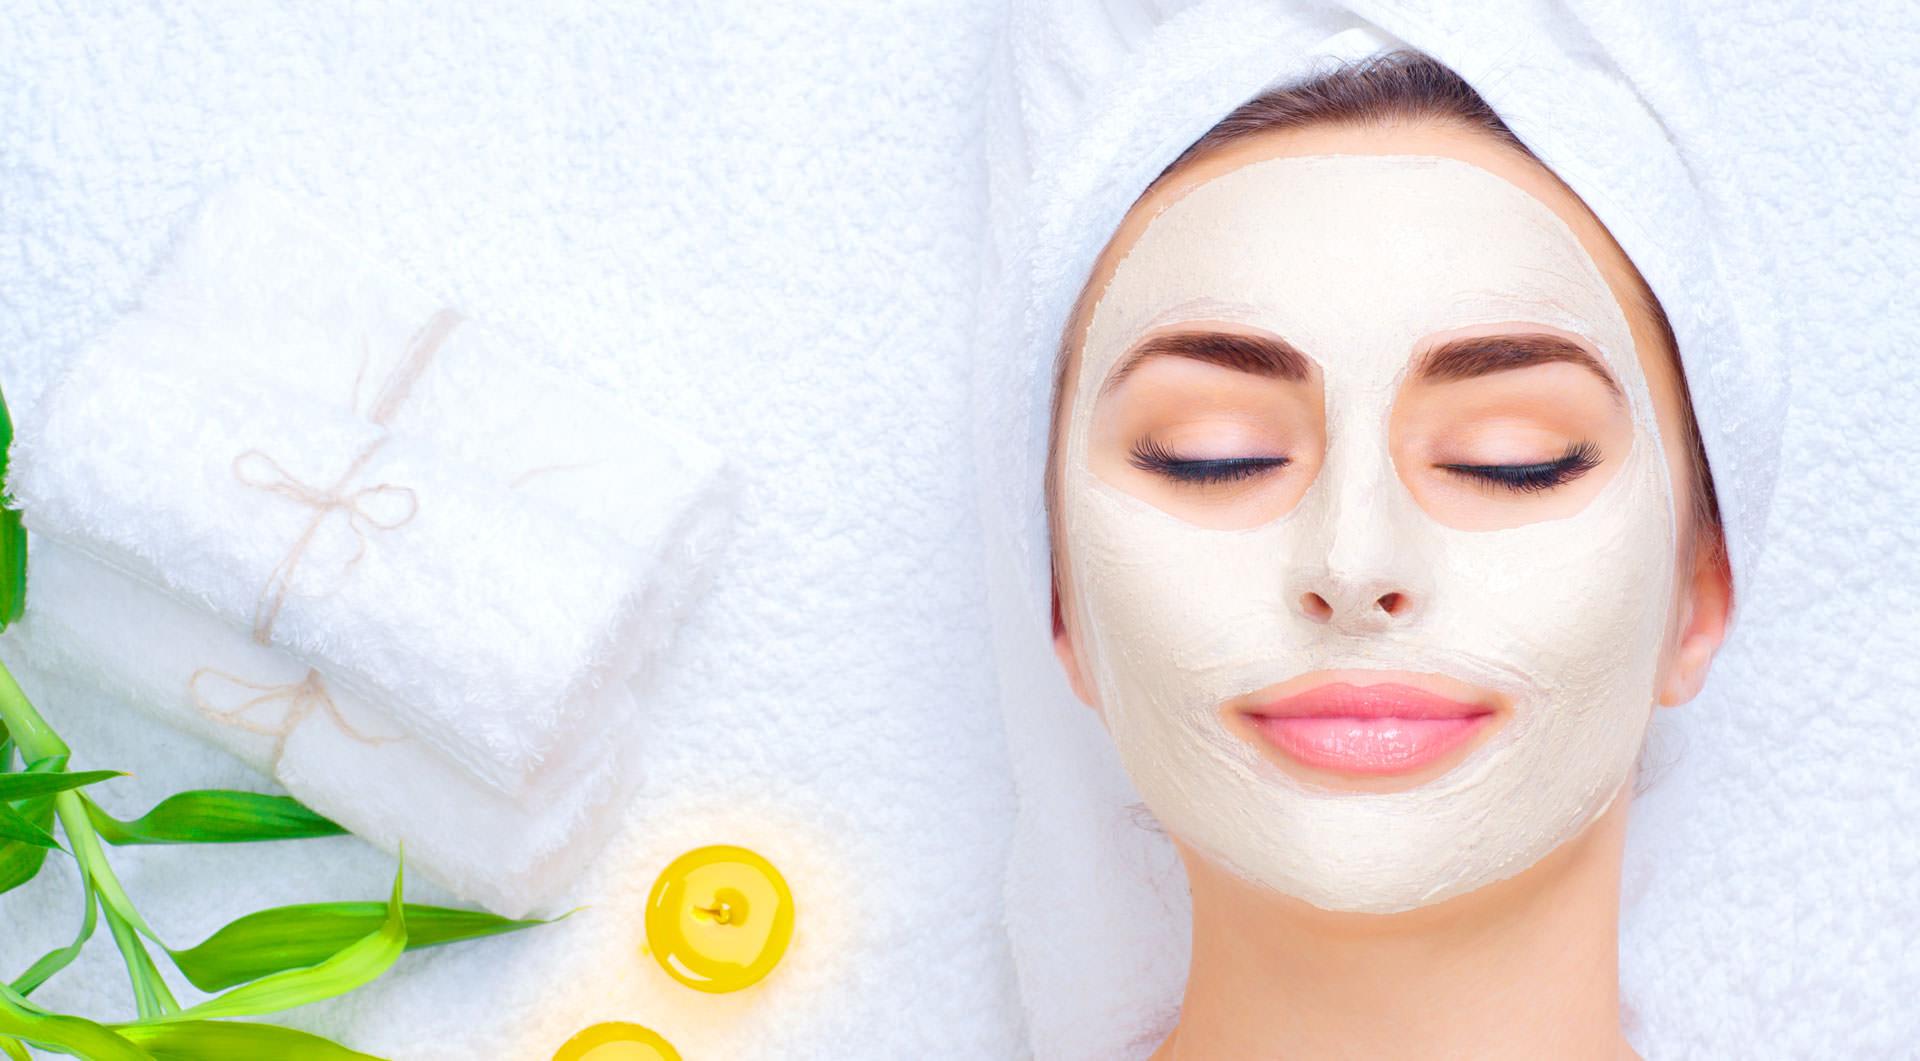 Klassische Kosmetikbehandlung